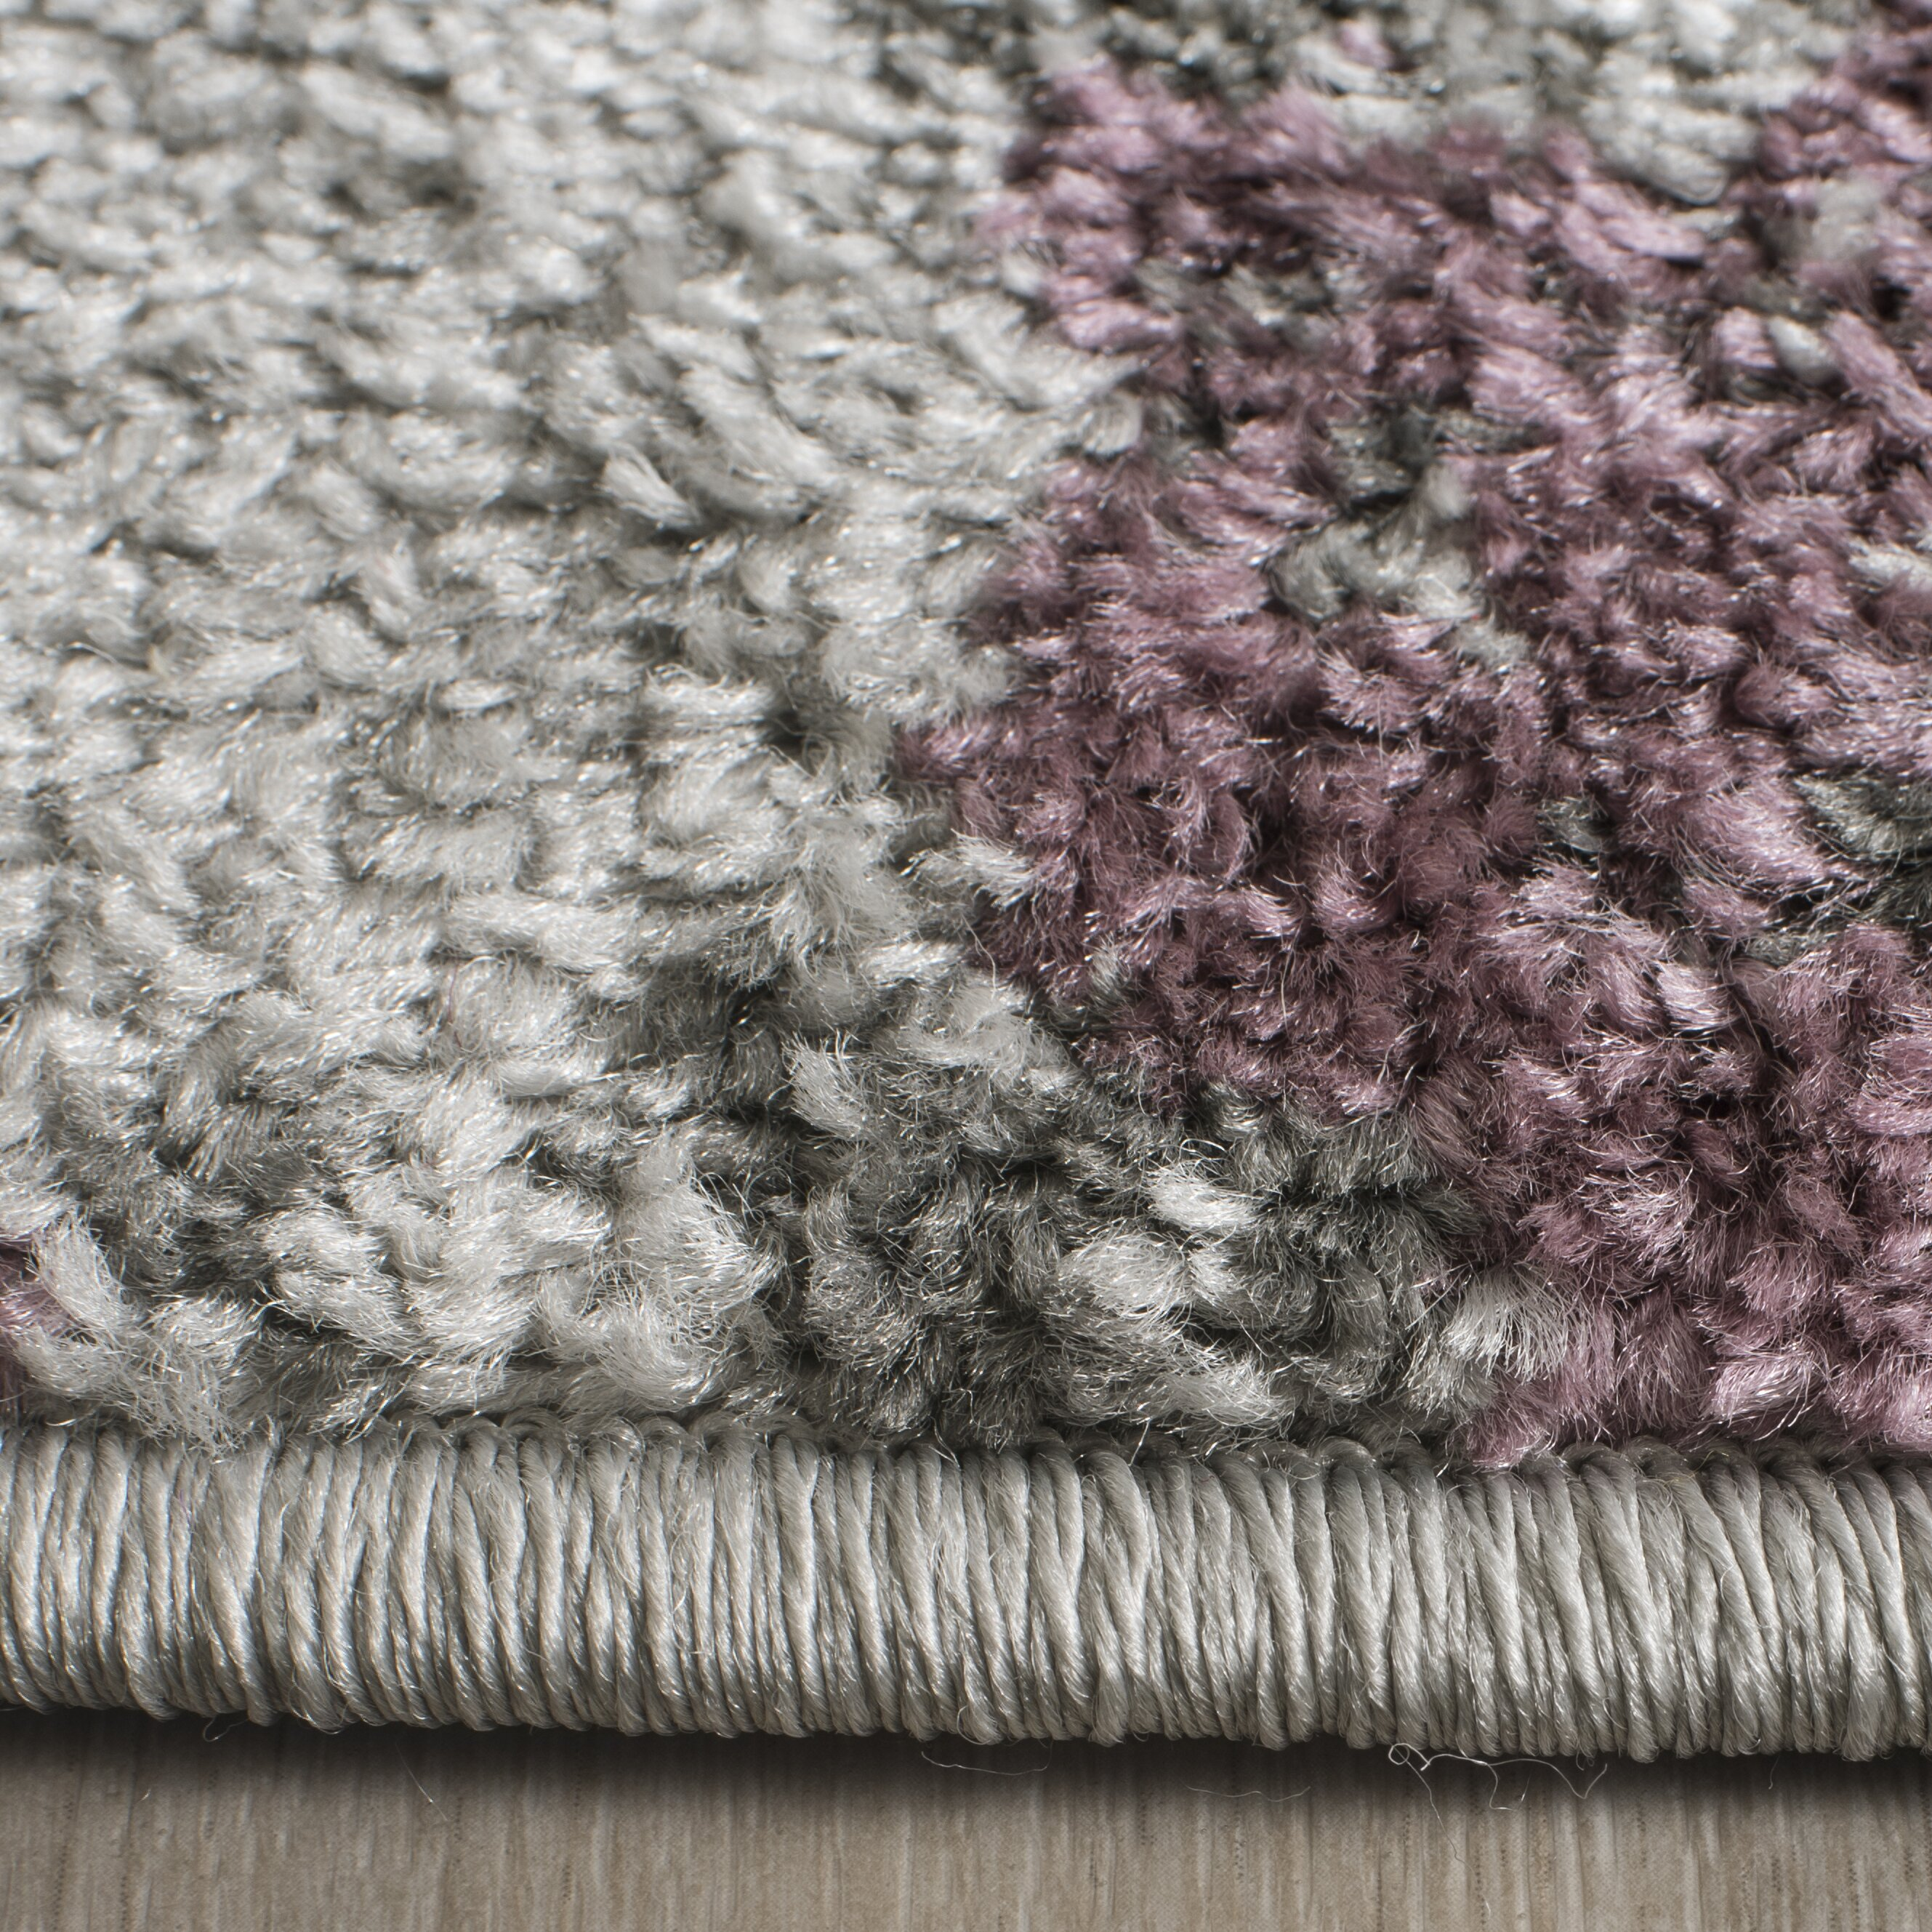 ^ area rugs grey and purple : ugs.xcyyxh.com